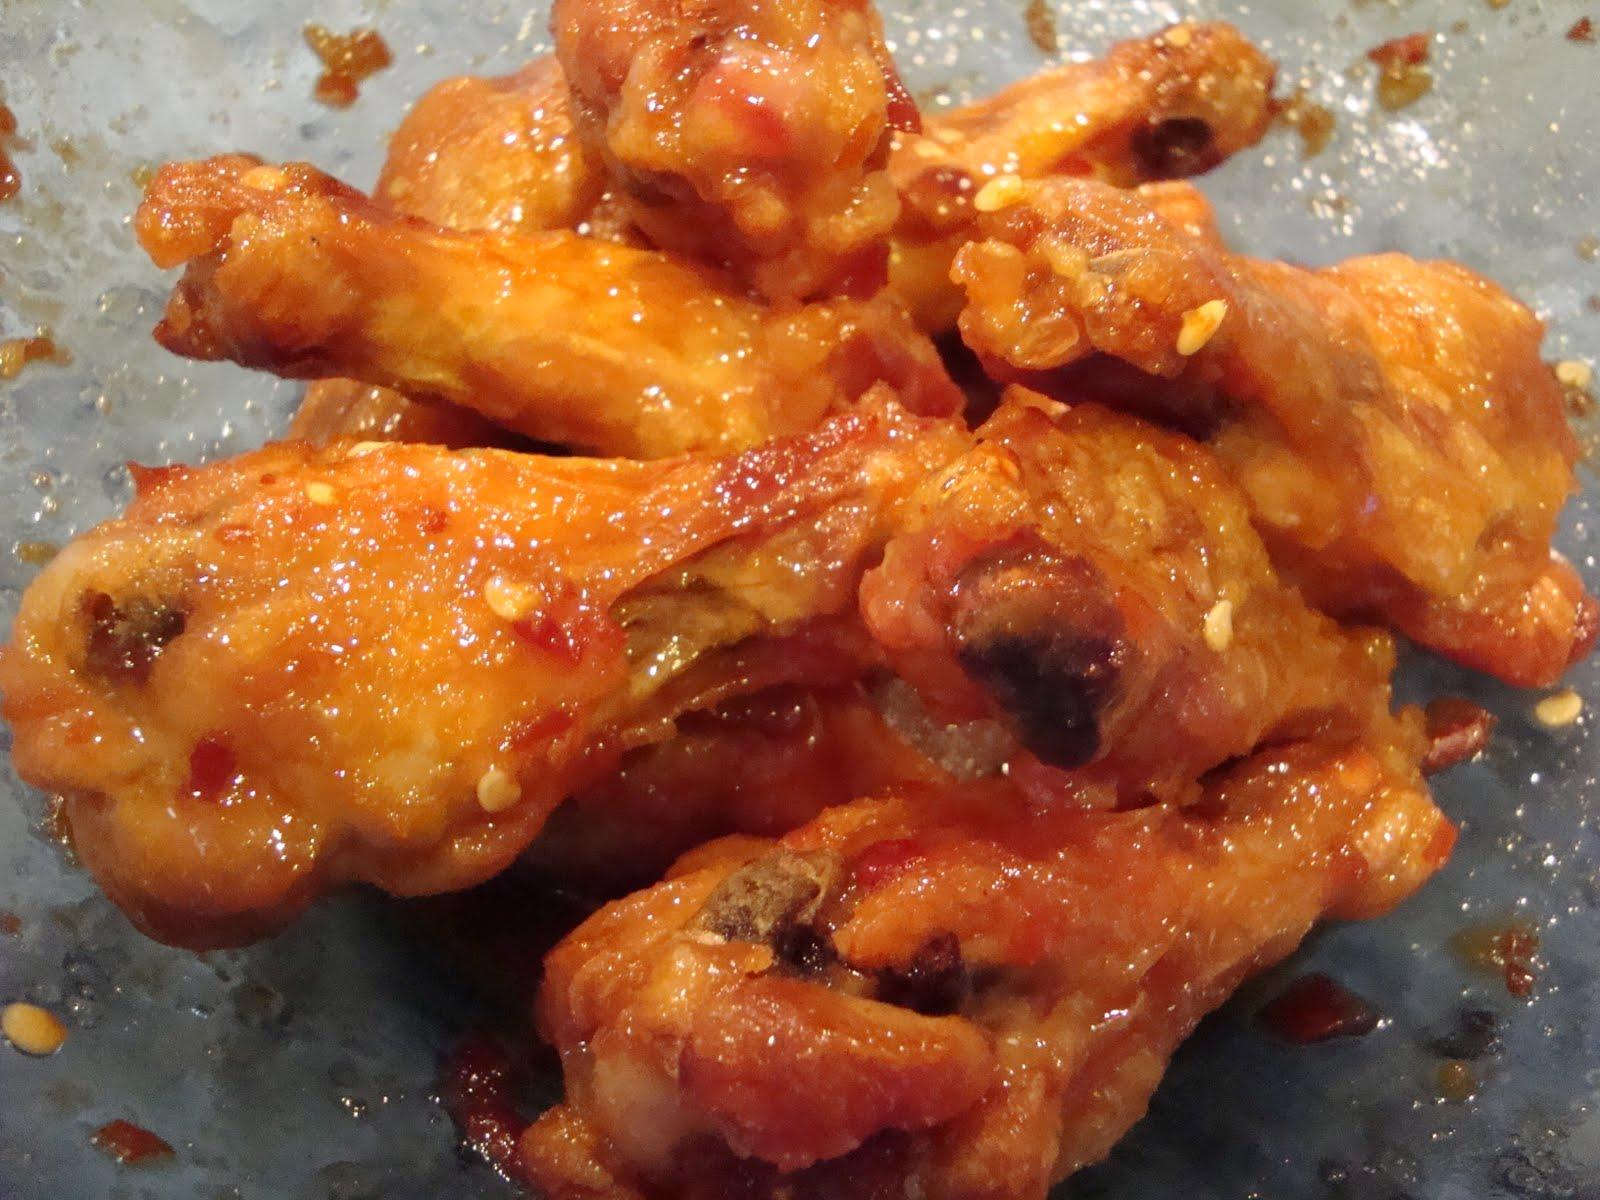 Spicy Chili Garlic and Sticky Brown Sugar Chicken Wings | Kitchen ...